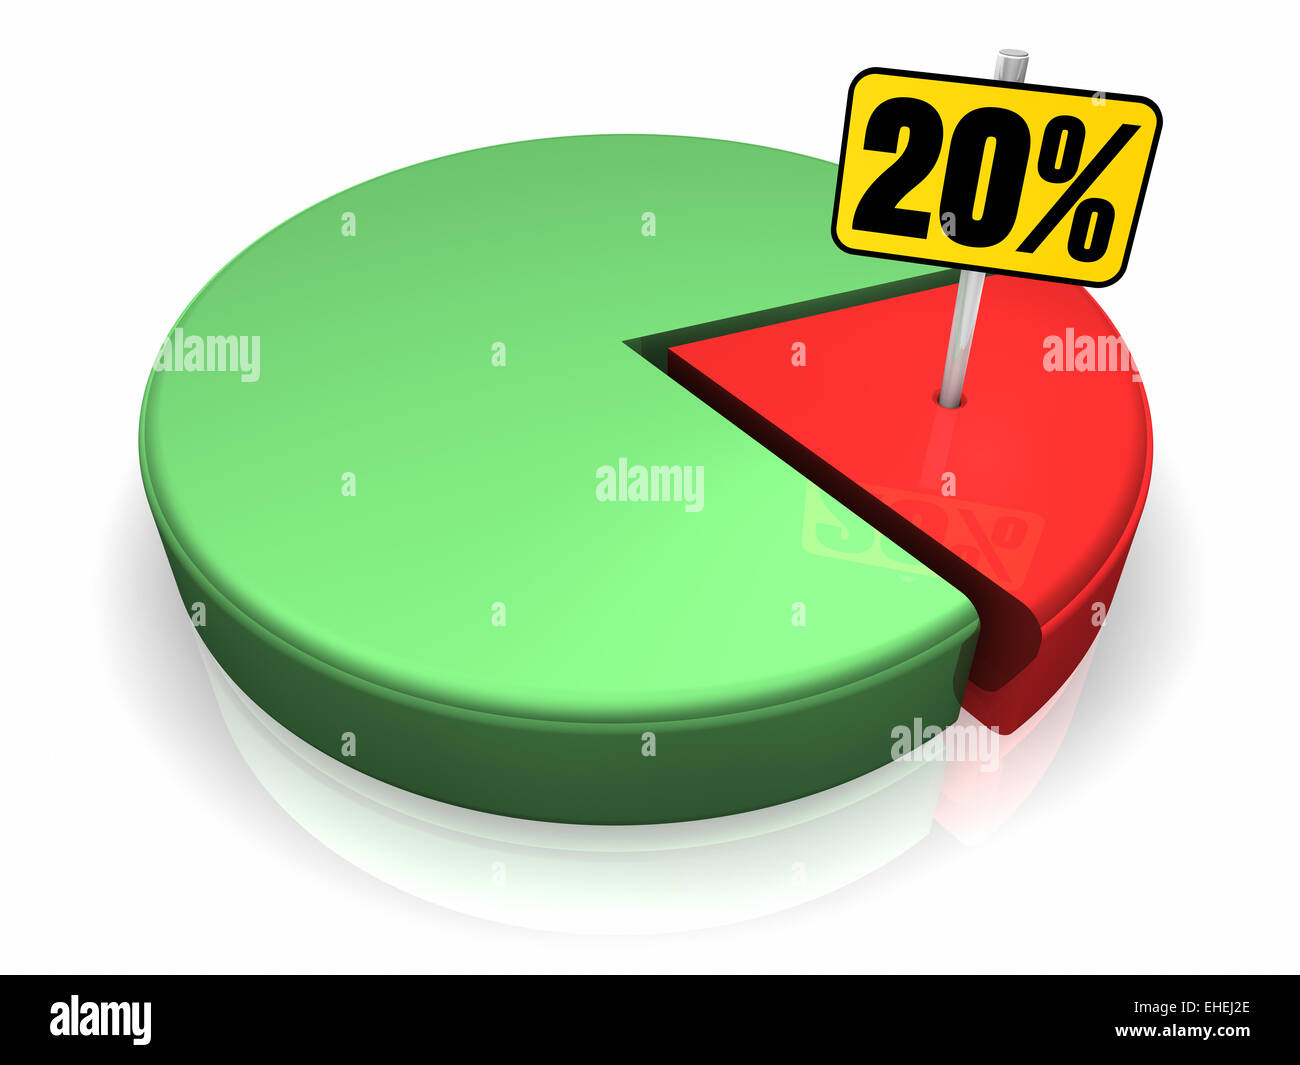 Pie chart 20 percent stock photo 79612134 alamy pie chart 20 percent nvjuhfo Image collections